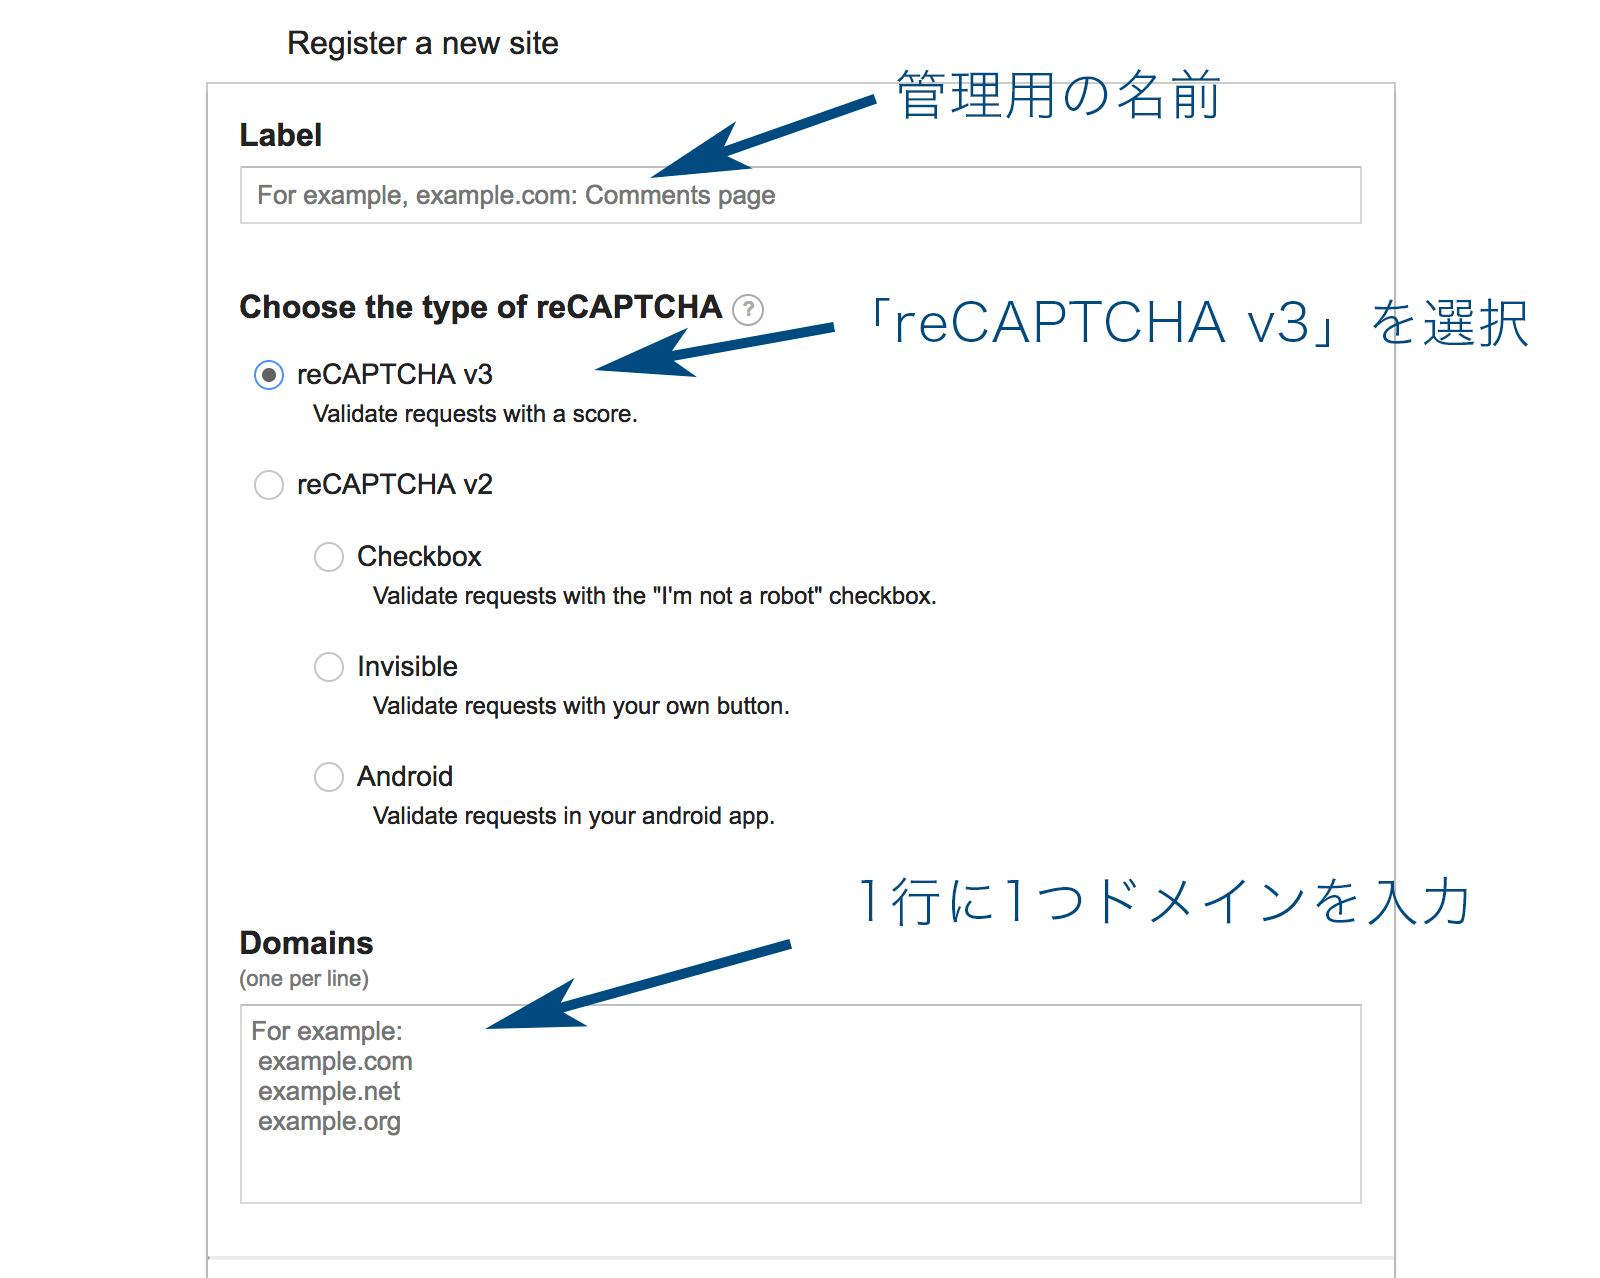 ;¥label、reCAPTCHAの種類、ドメインを入力する